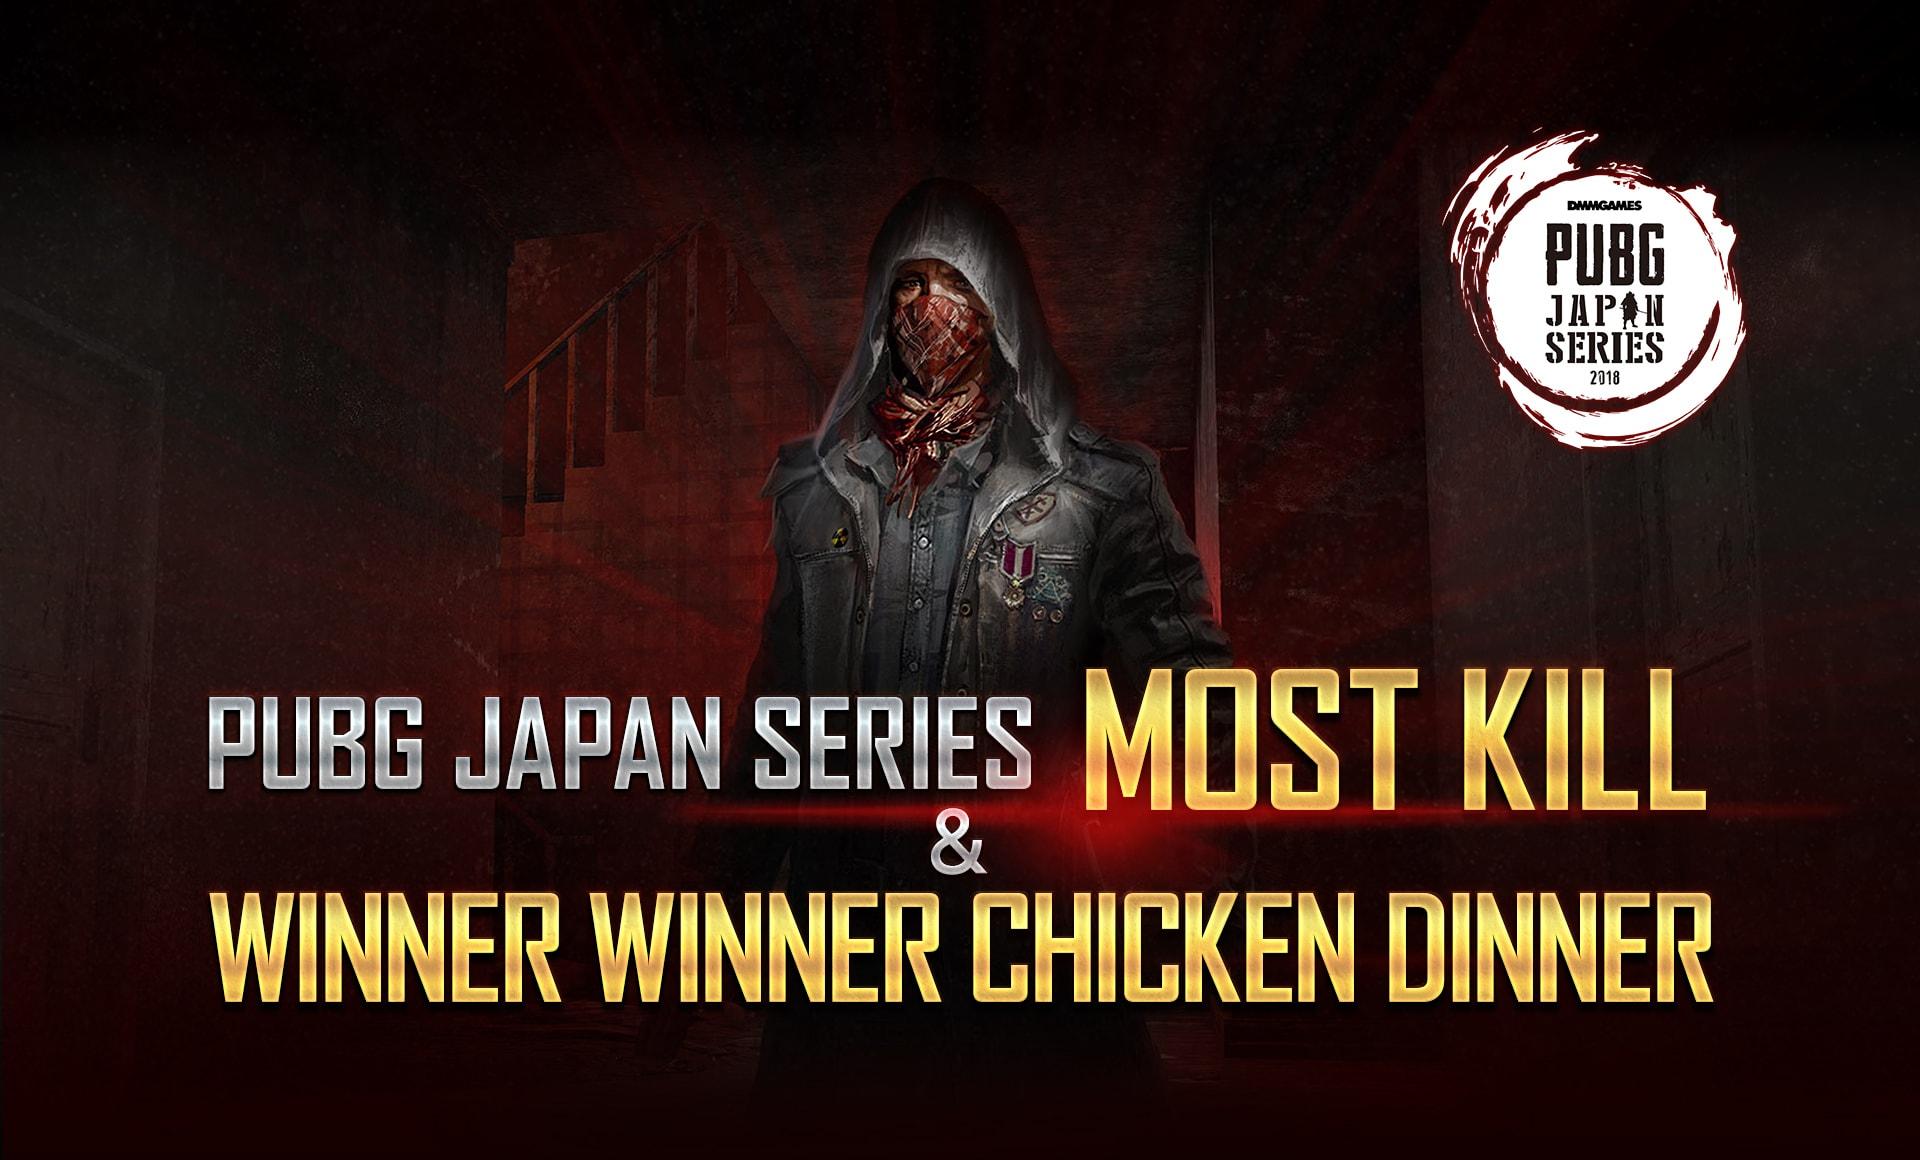 『PUBG JAPAN SERIES』βリーグ、世界大会への切符を掴んだのは「Crest Gaming Xanadu」「Crest Gaming Windfall」